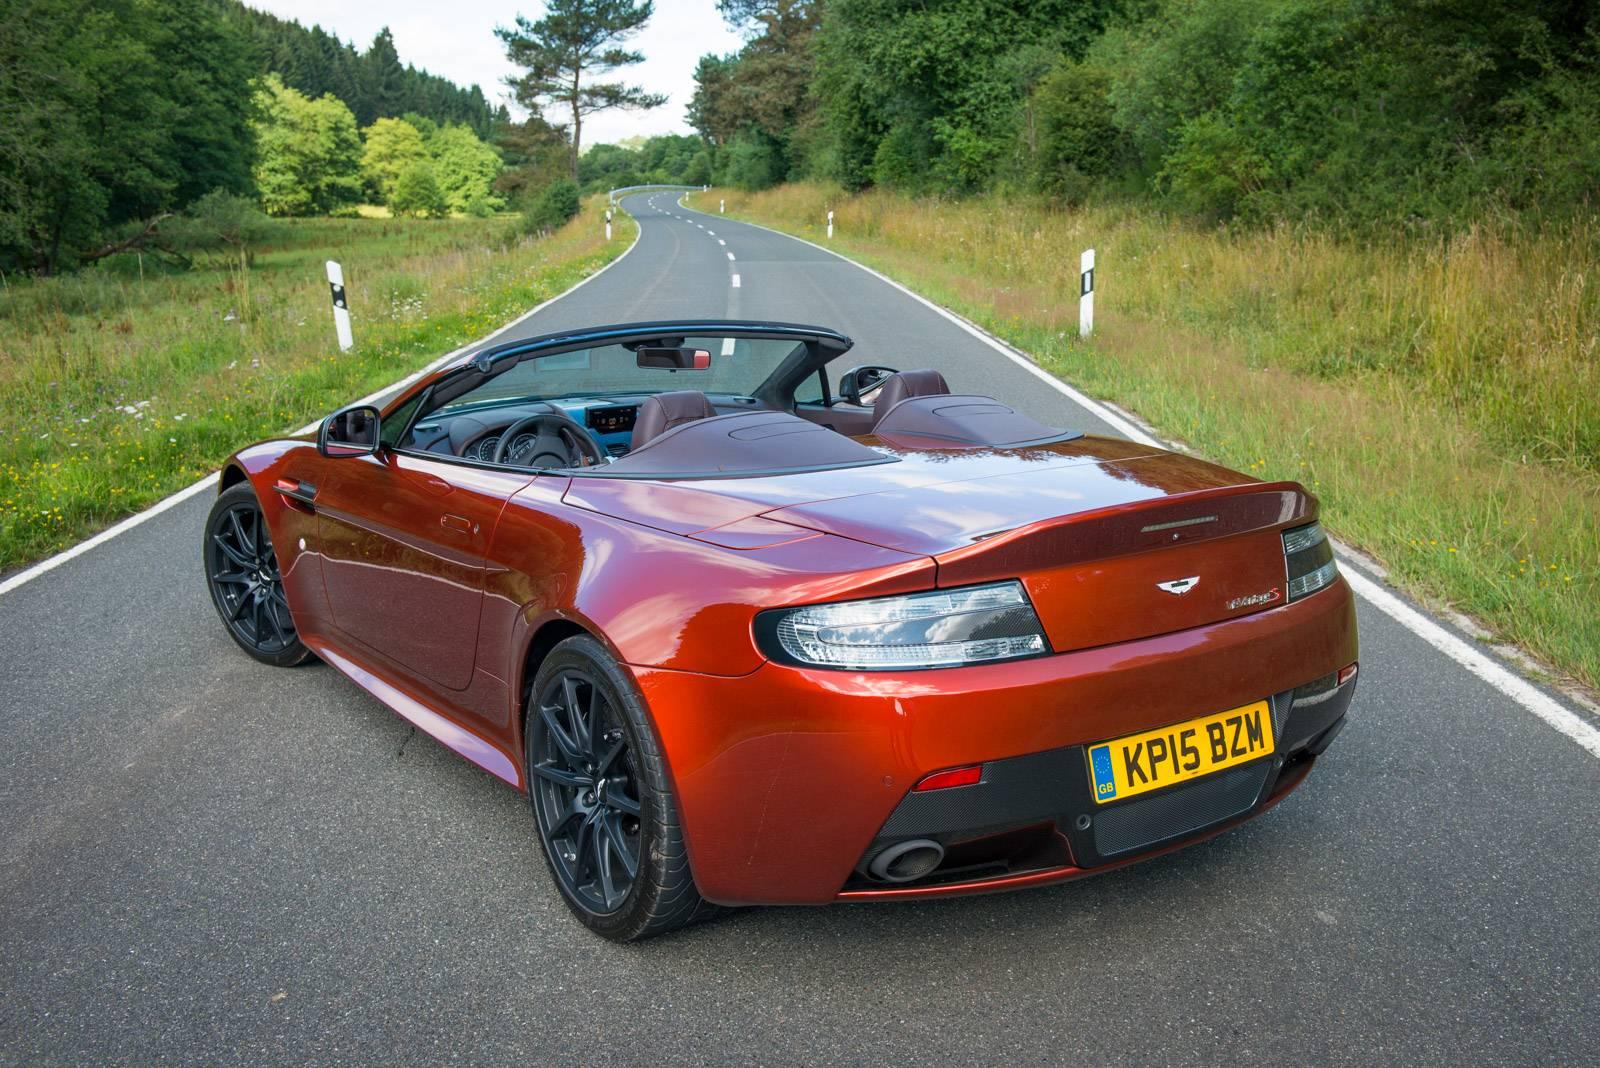 2016 Aston Martin V12 Vantage S Roadster Review  GTspirit